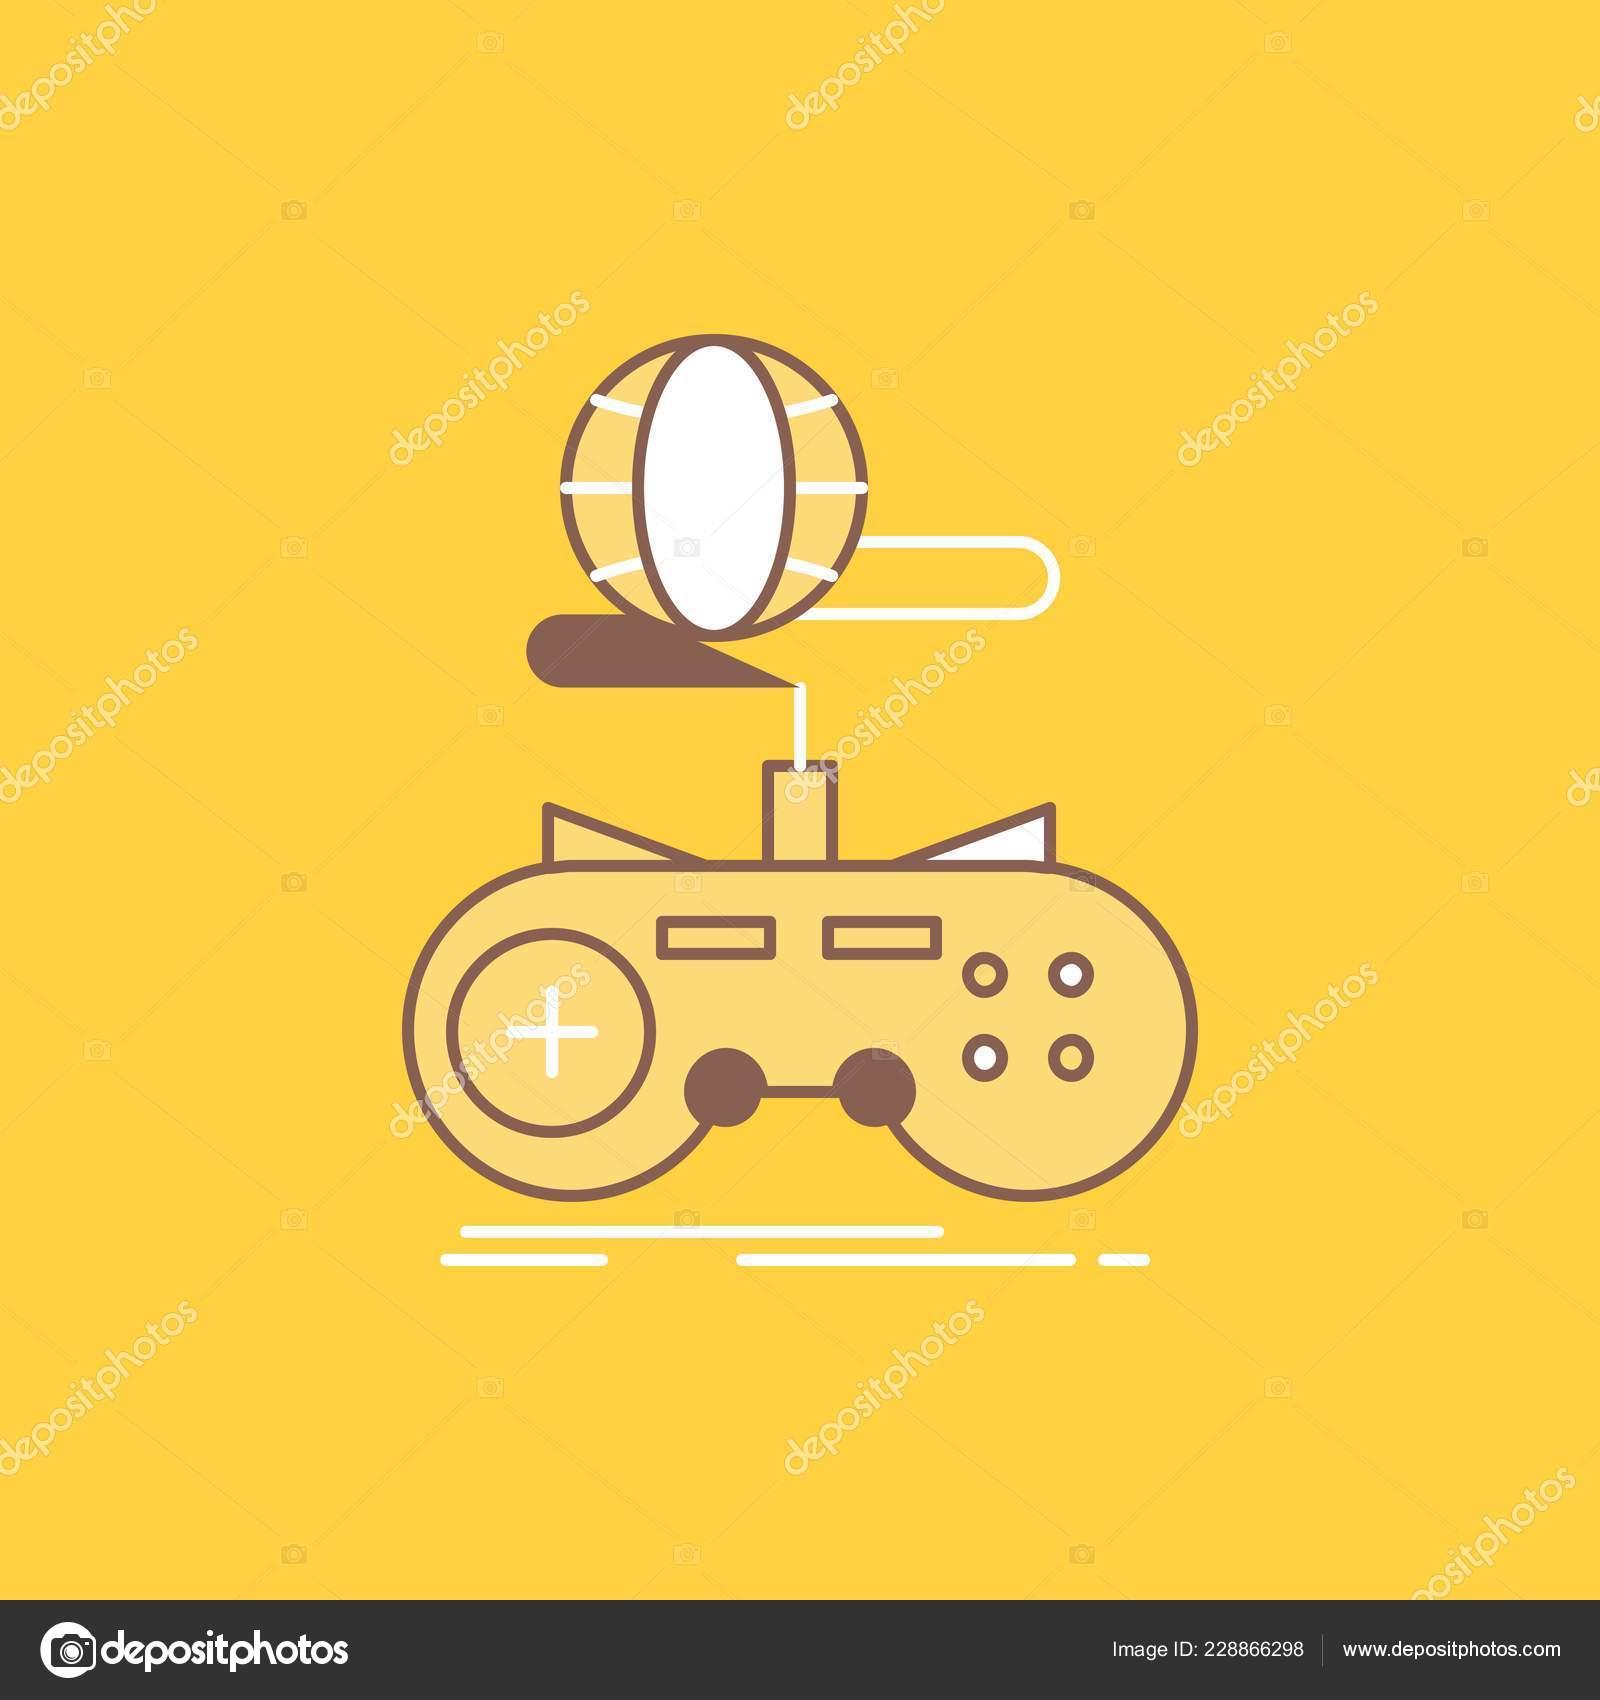 Game Gaming Internet Multiplayer Online Flat Line Filled